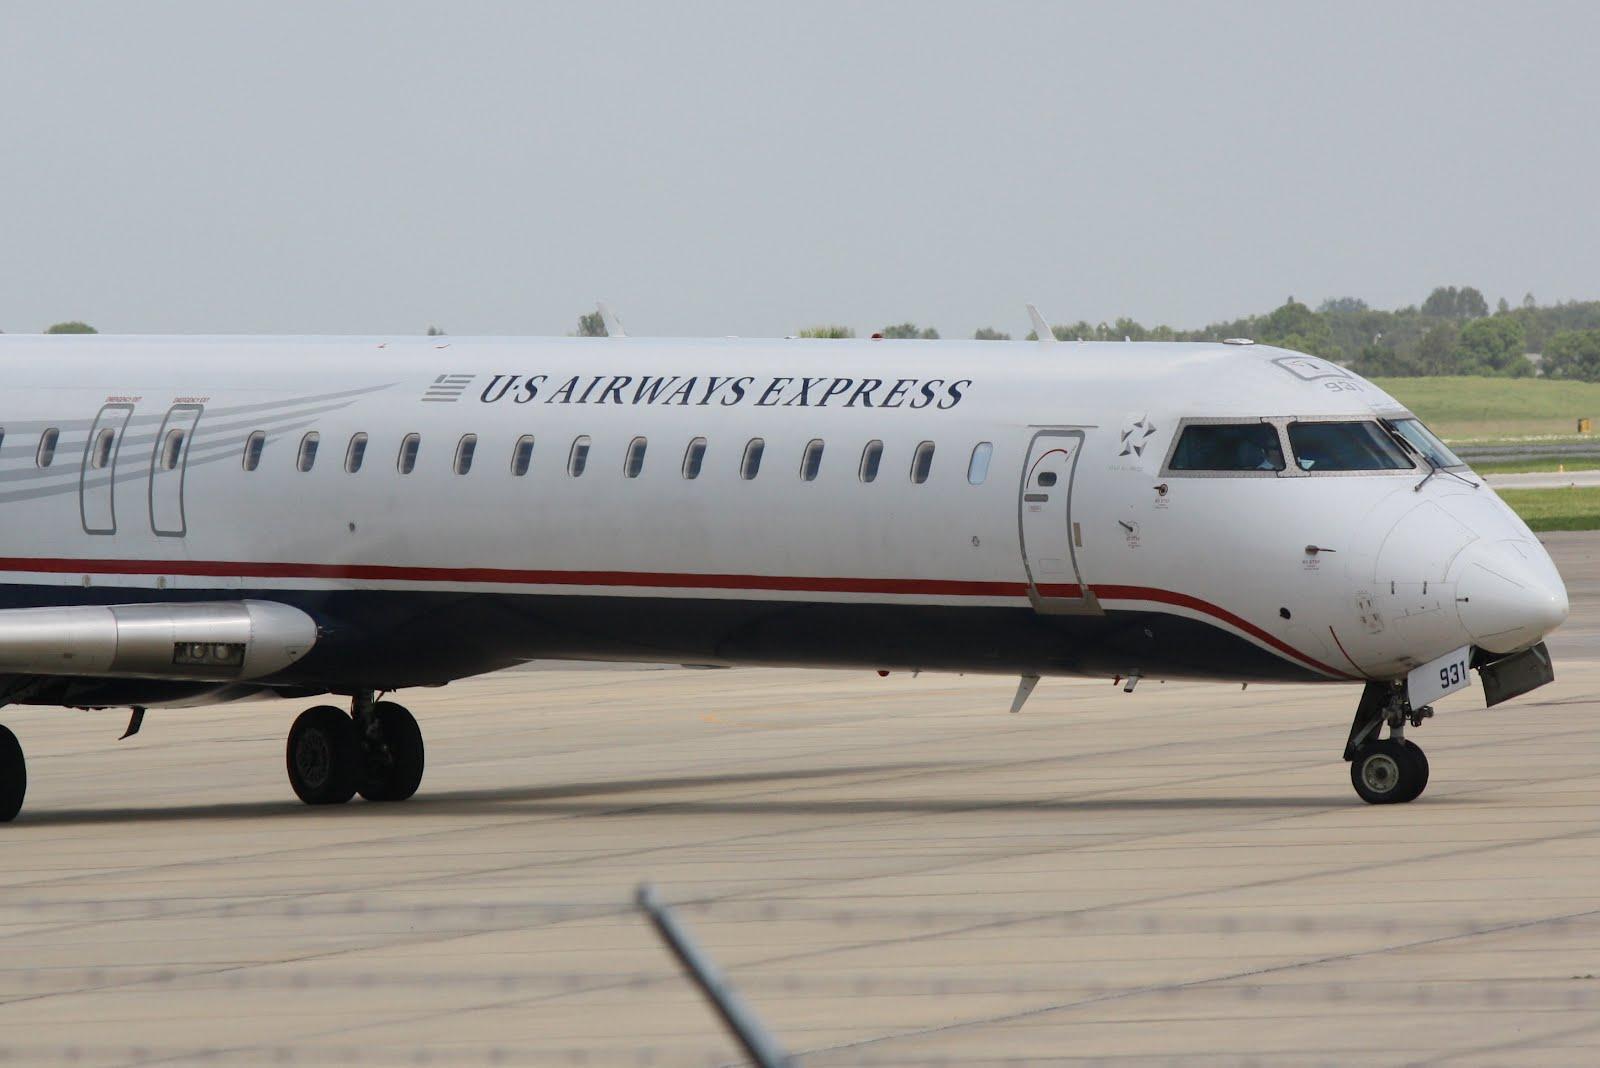 canadair jet 900